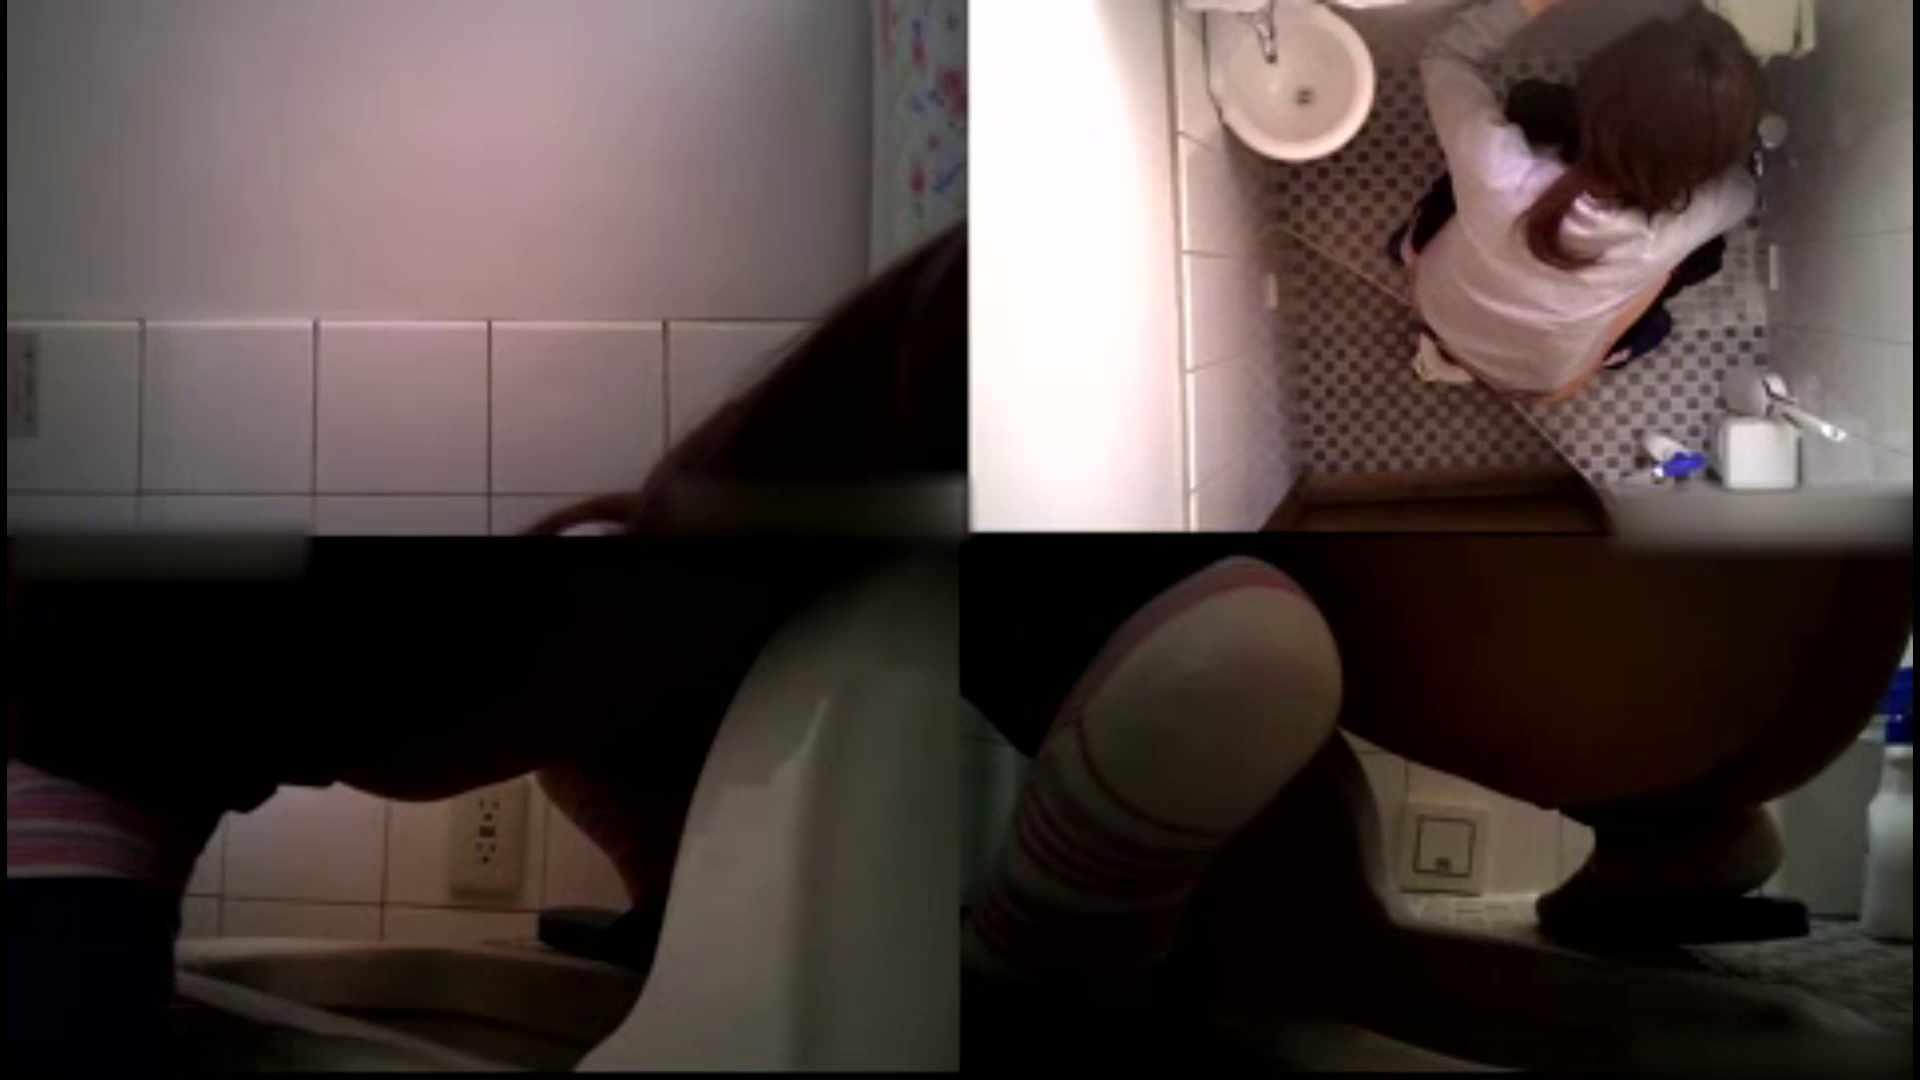 Vol.05 花の女子大生 トイレ恥態 進化系マルチアングル!! 盛合せ スケベ動画紹介 66画像 11